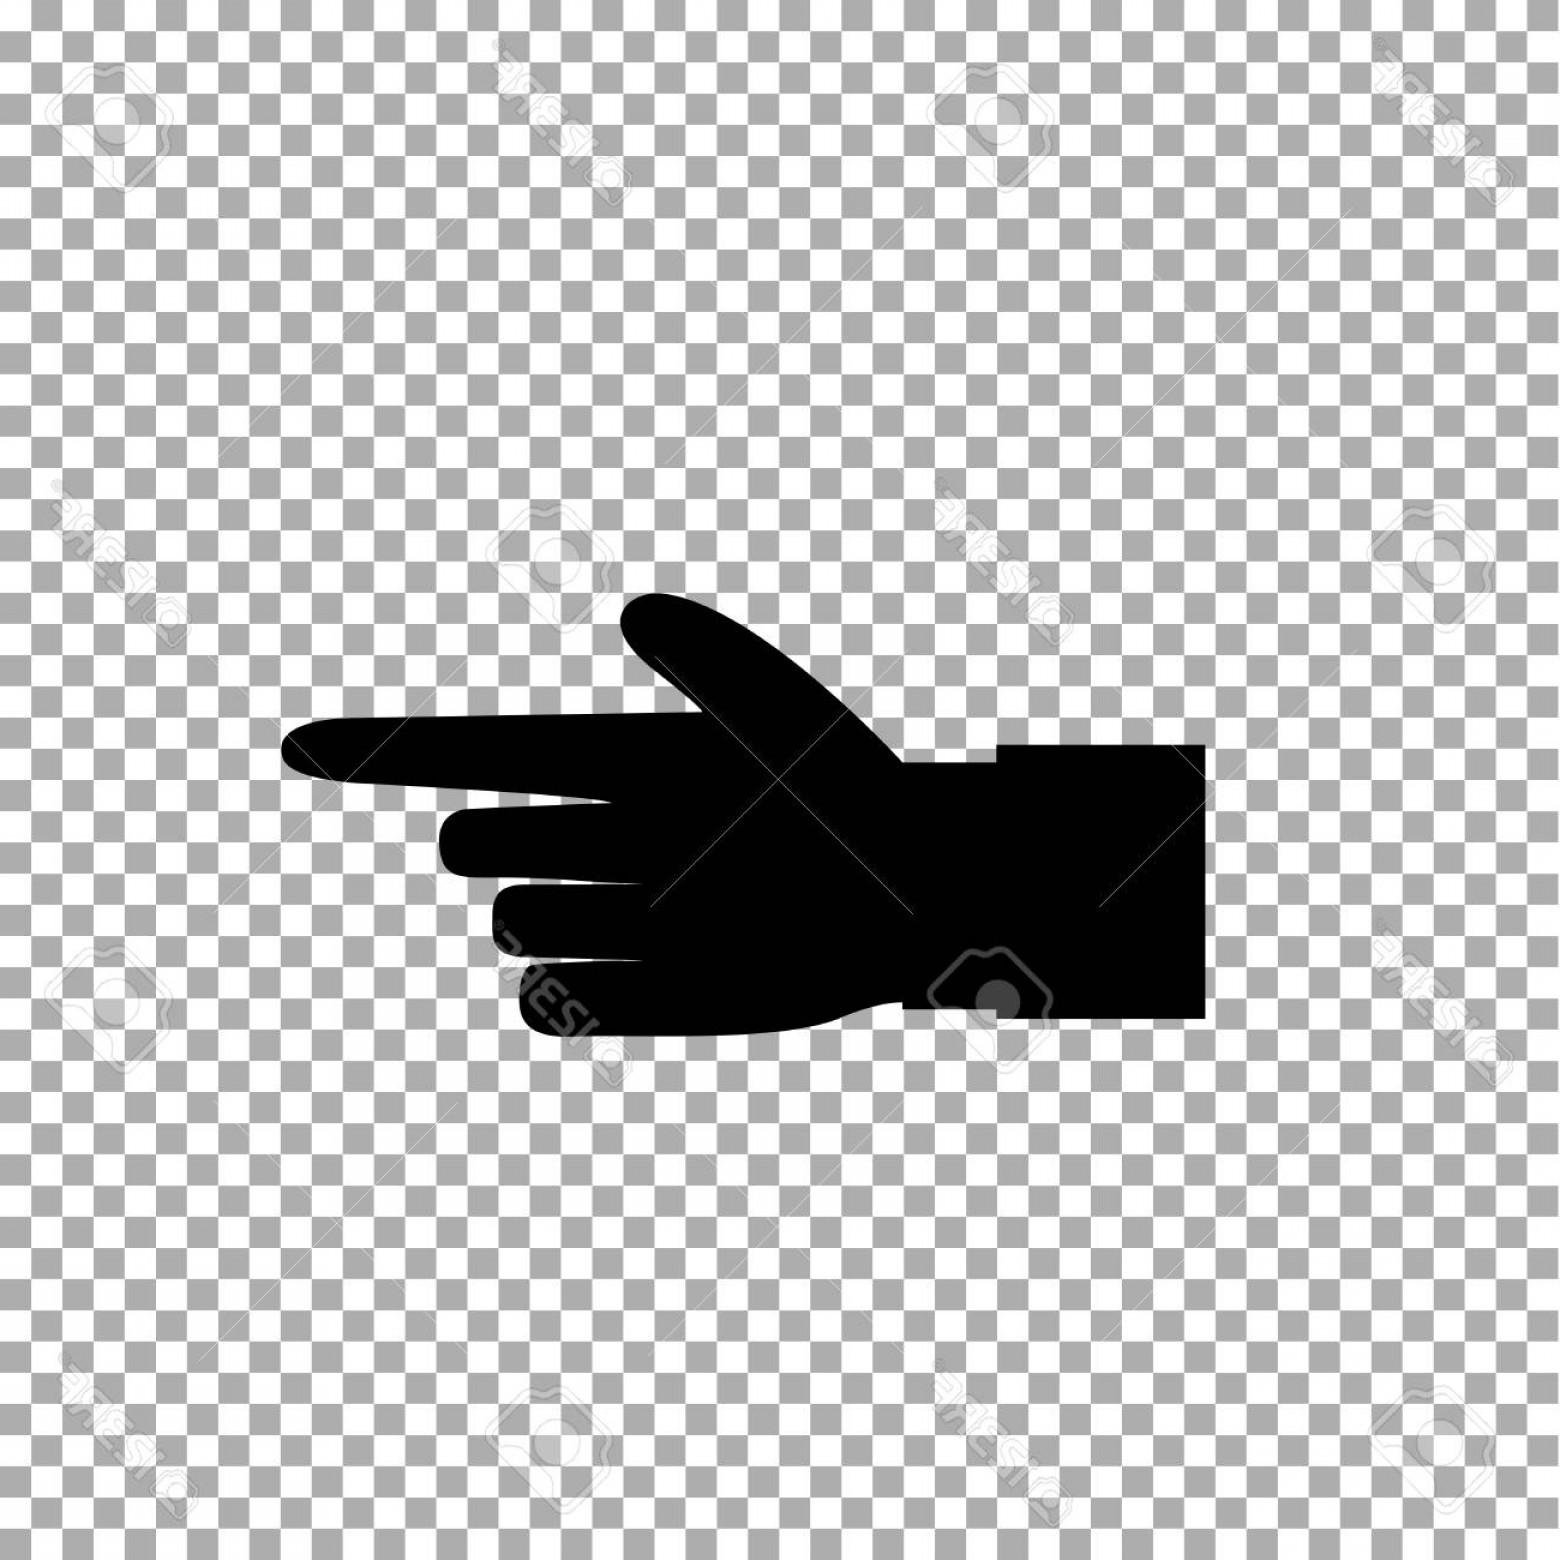 1560x1560 Pointing Hand Vector Transparent Sohadacouri